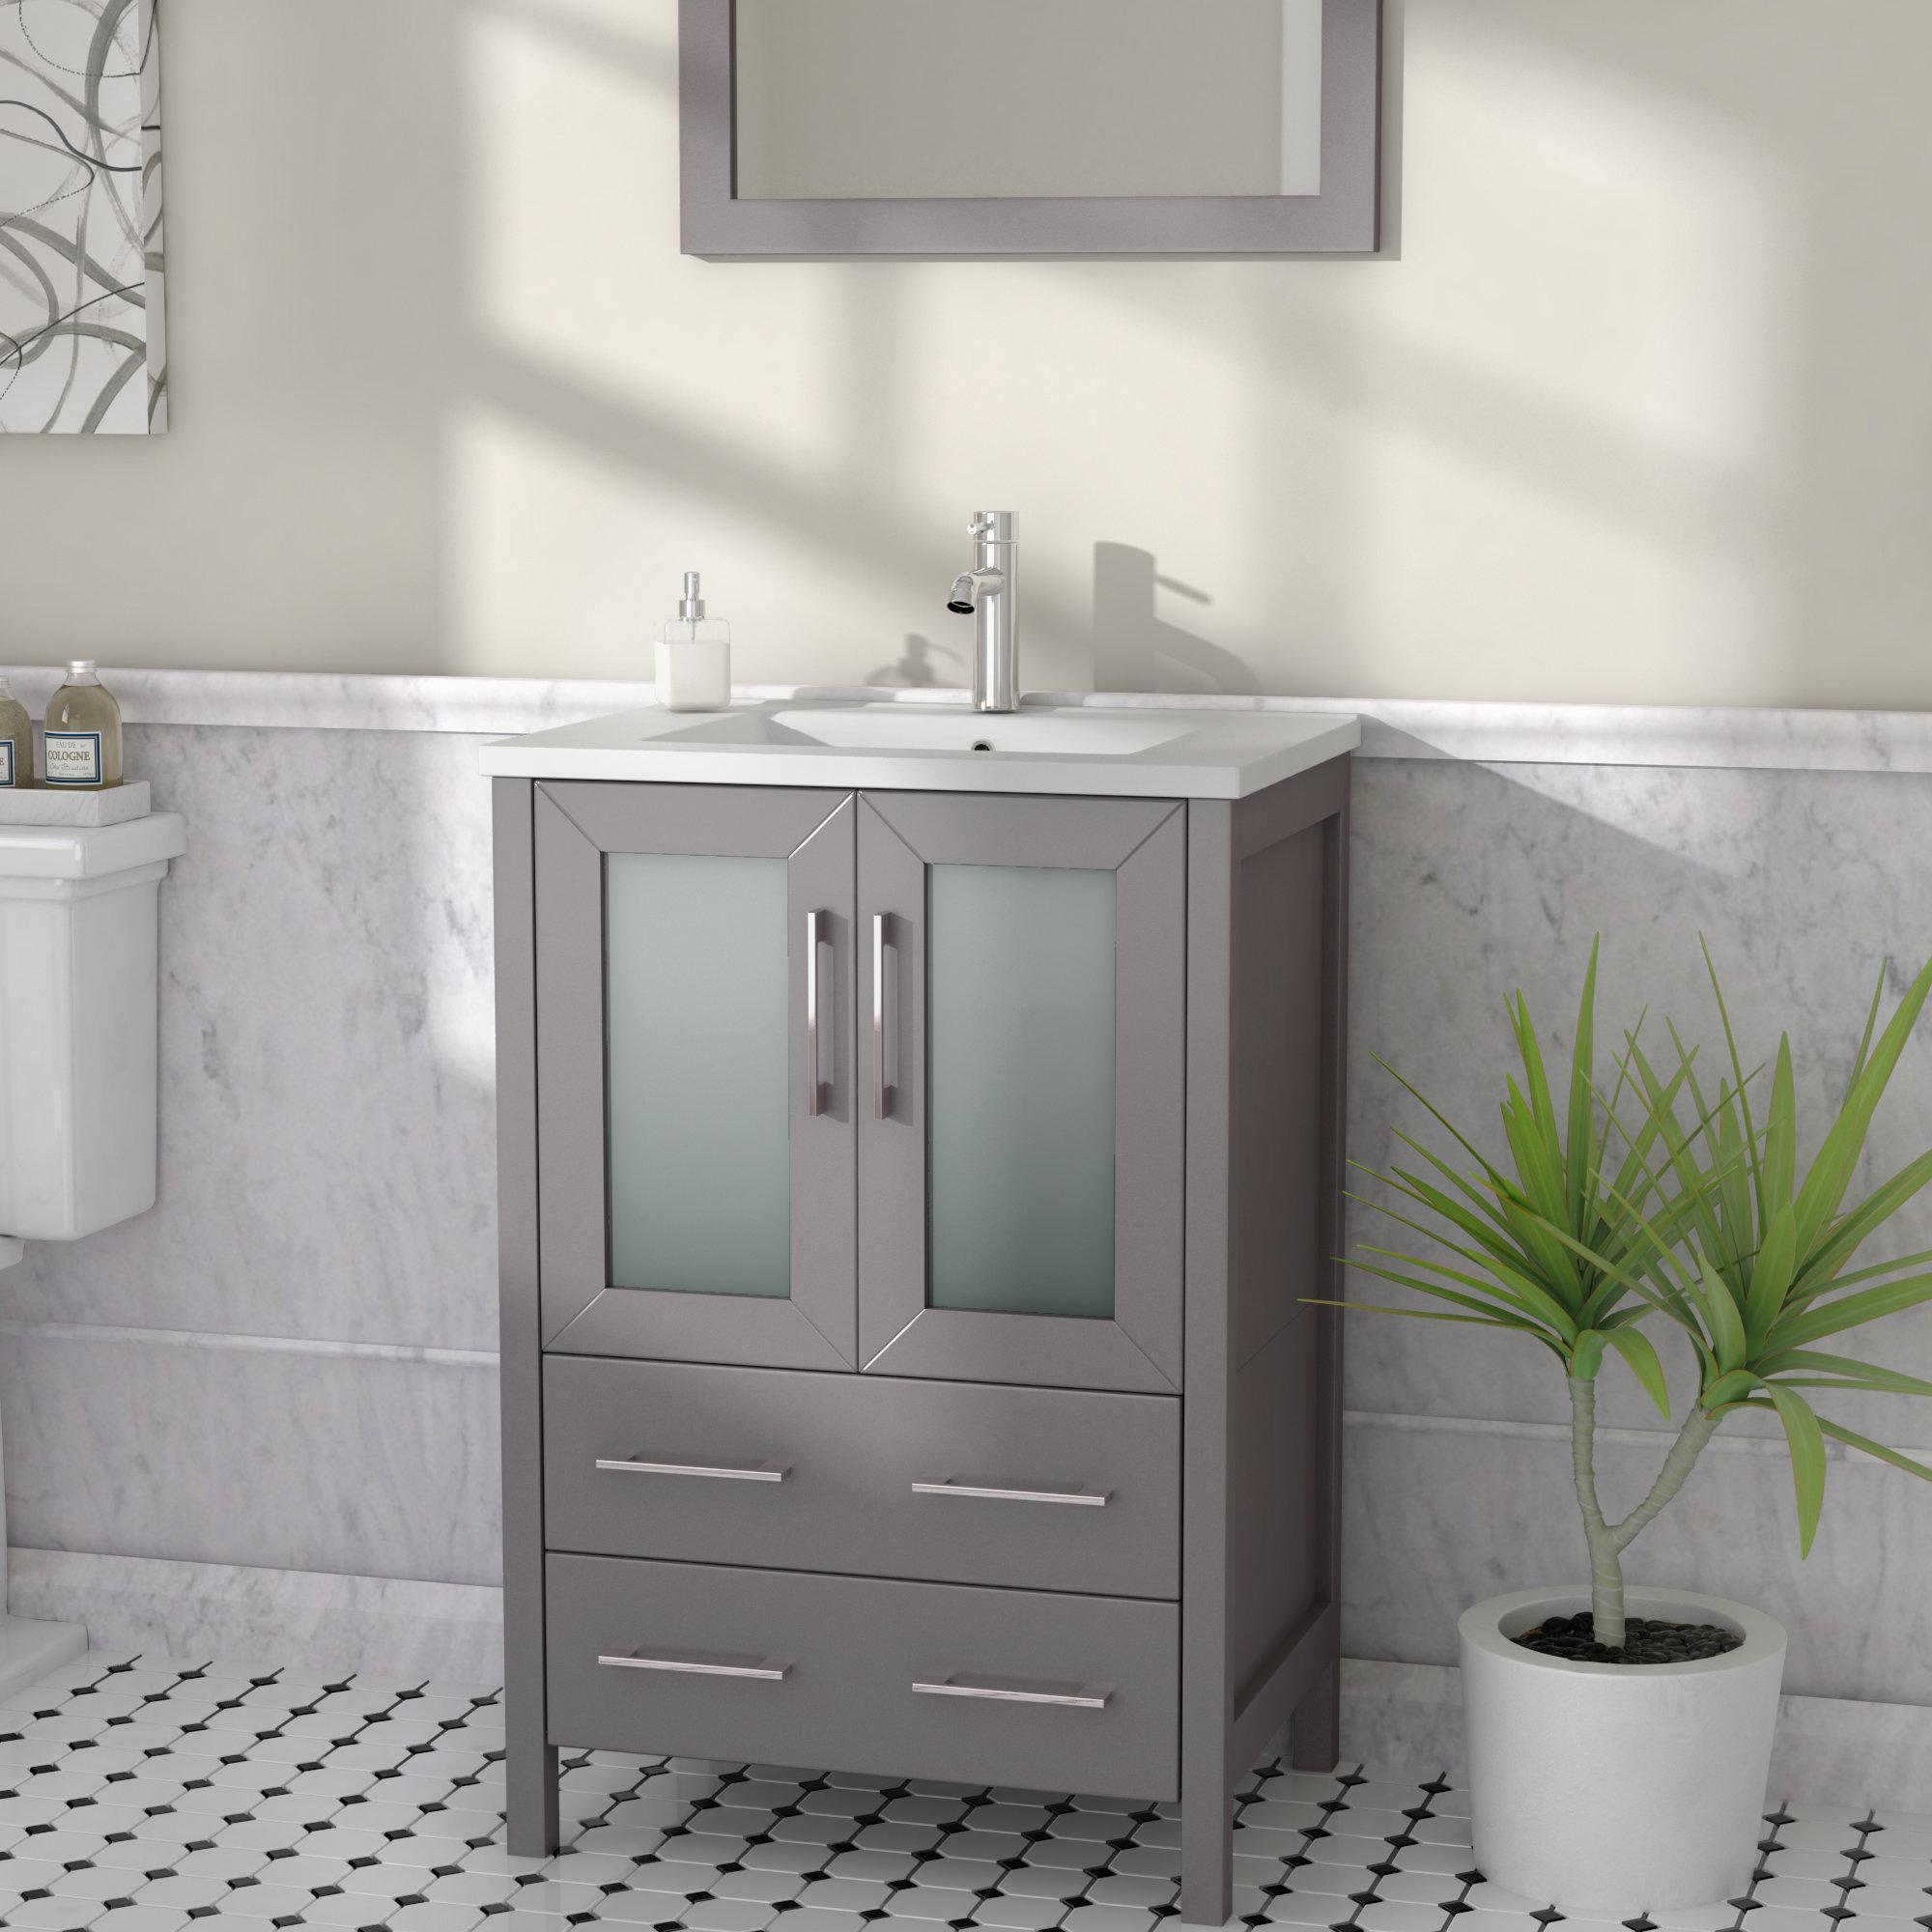 Karson 24 Single Bathroom Vanity Set With Mirror in size 2000 X 2000